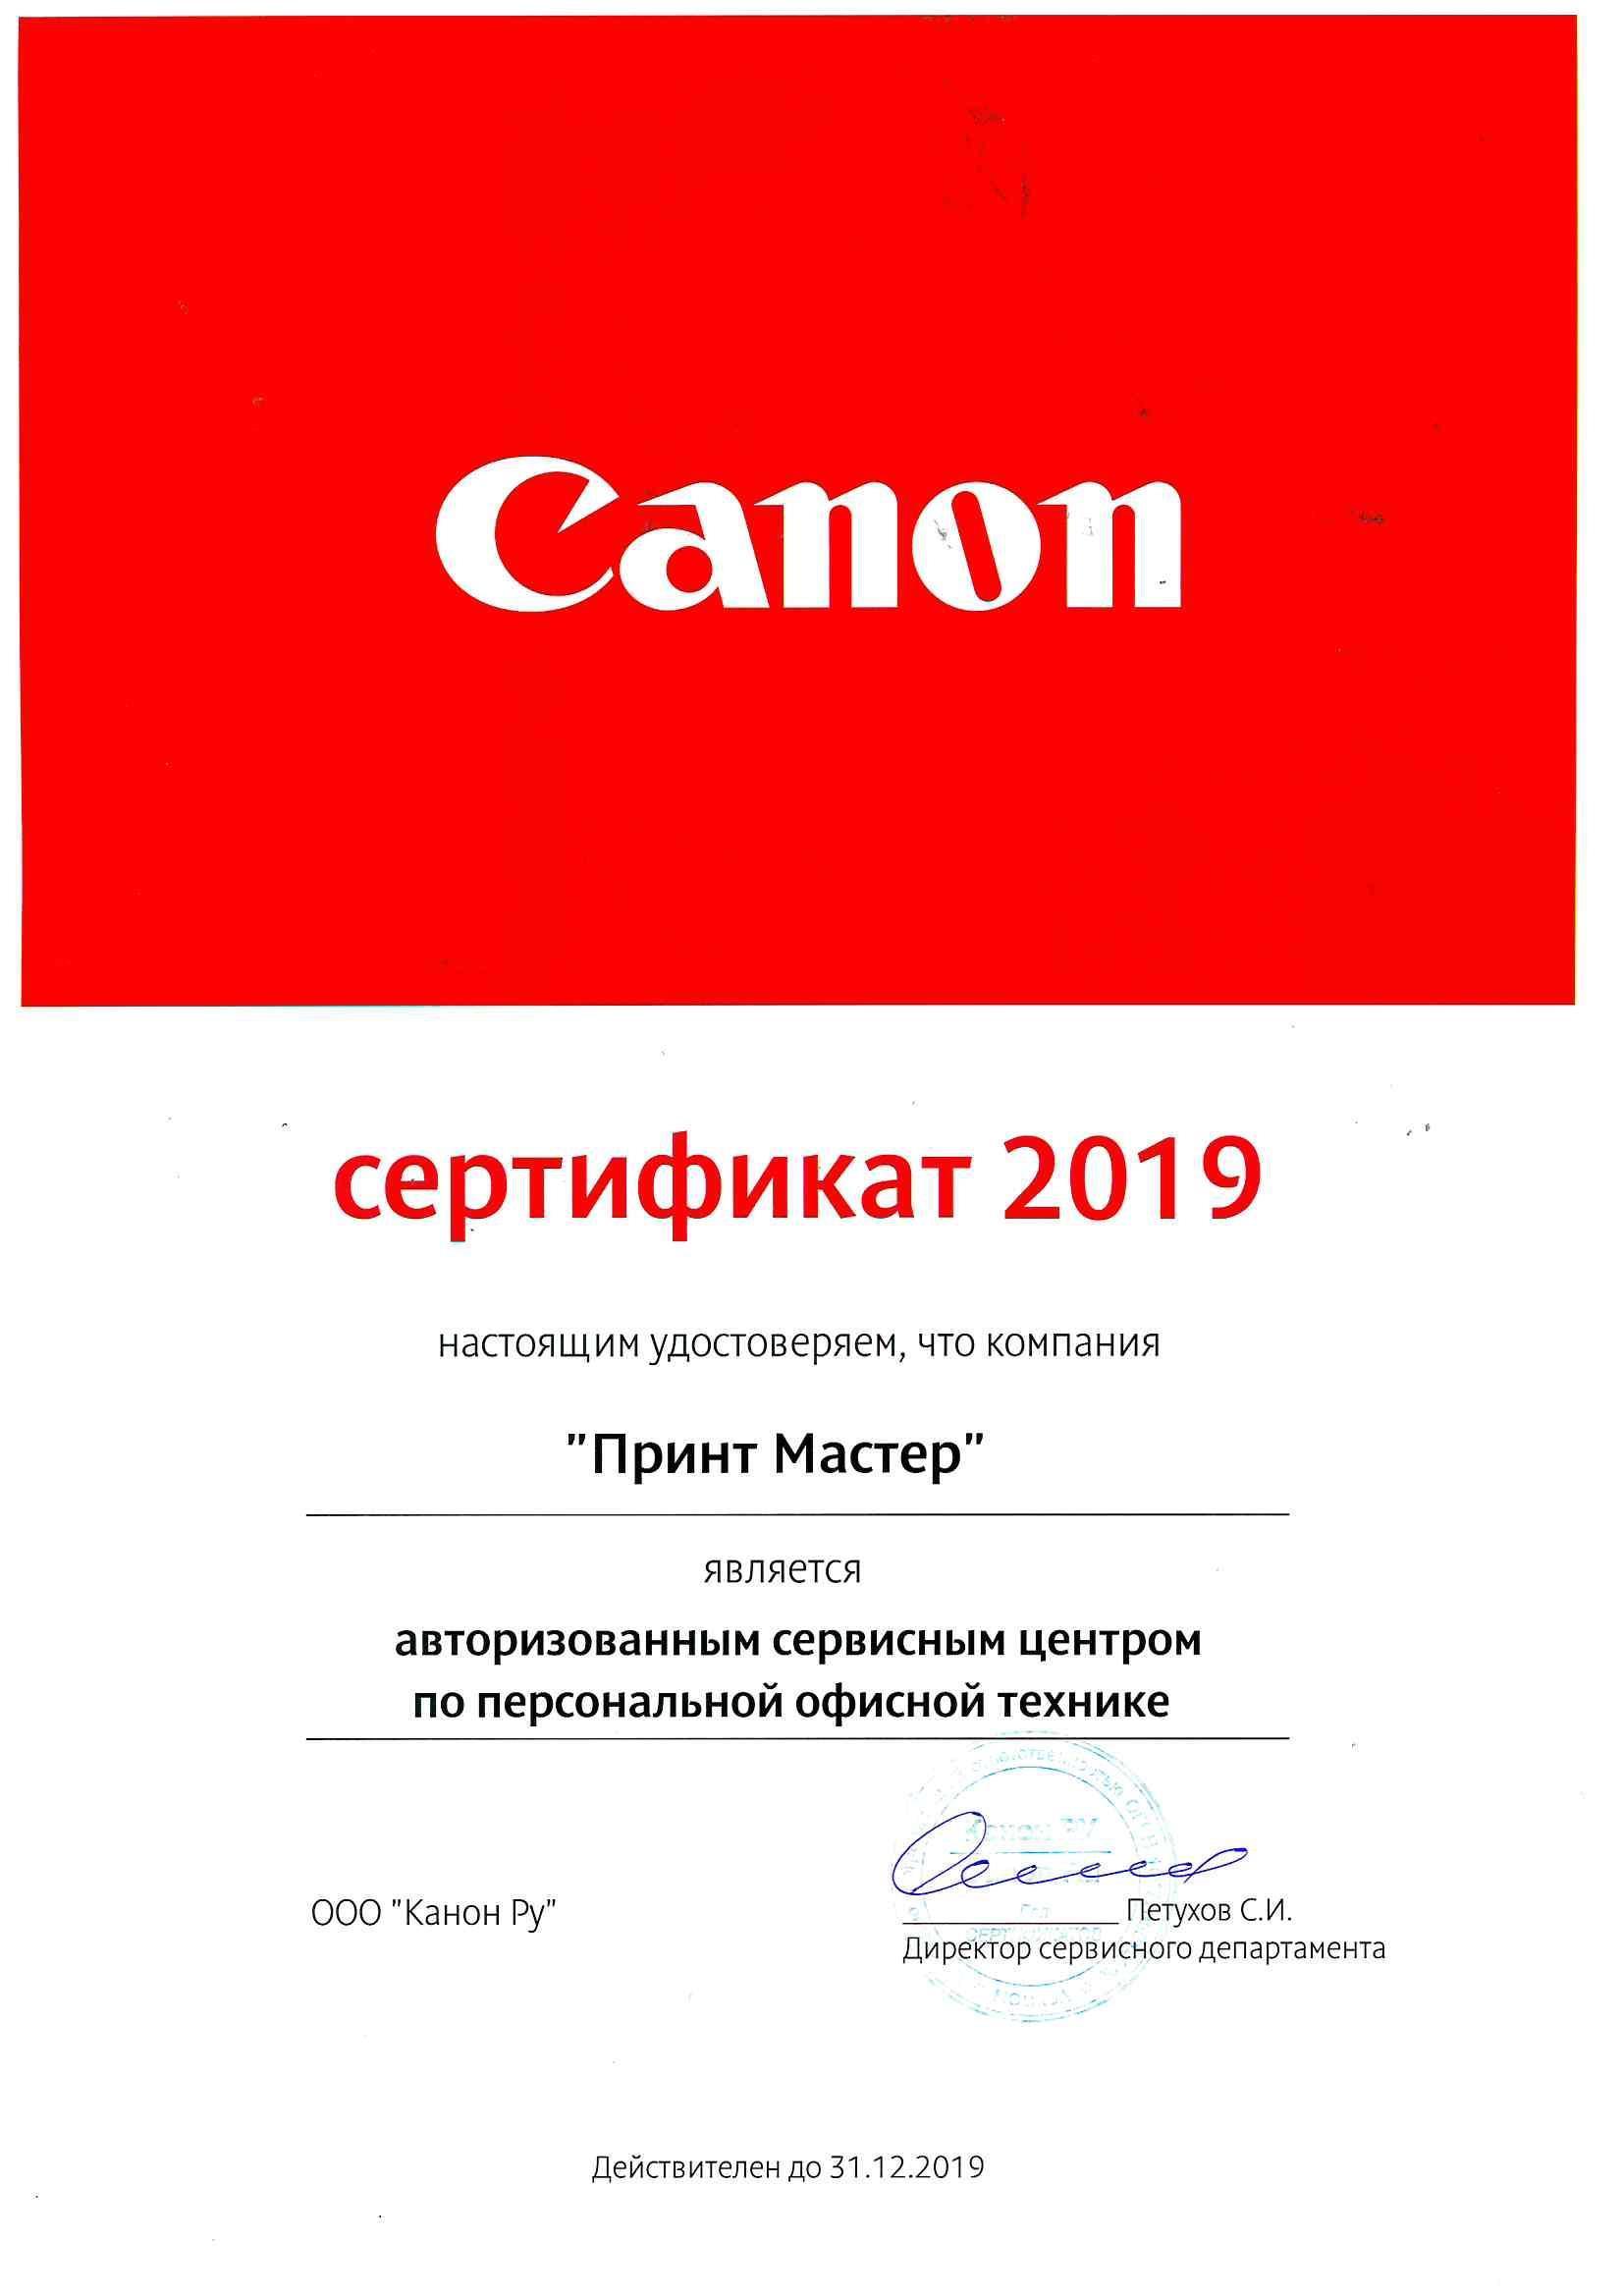 Canon 2019